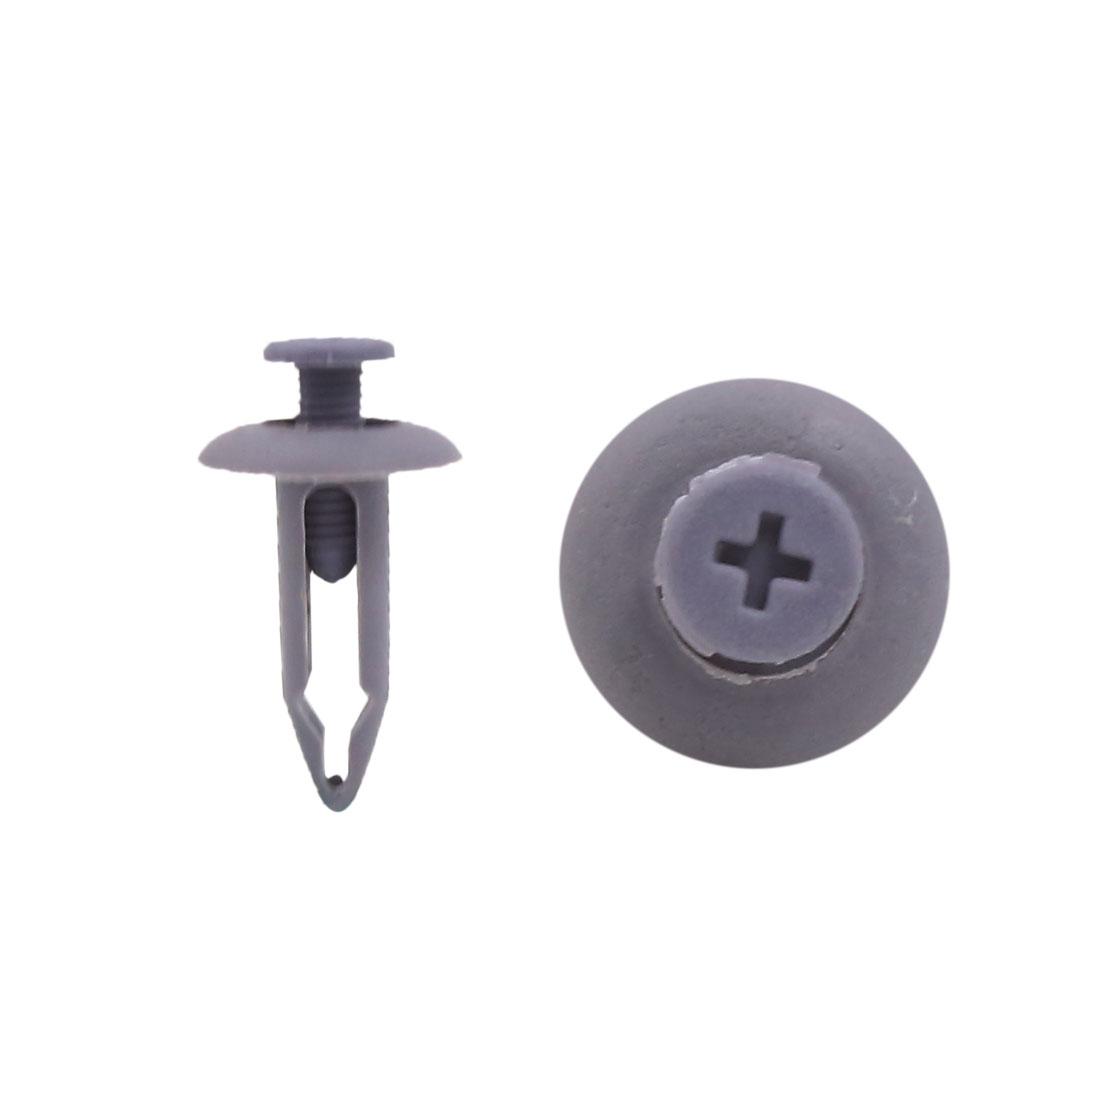 50Pcs Plastic Gray Bumper Fastener 7mm Hole Dia Push Type Clip Retainer Rivets